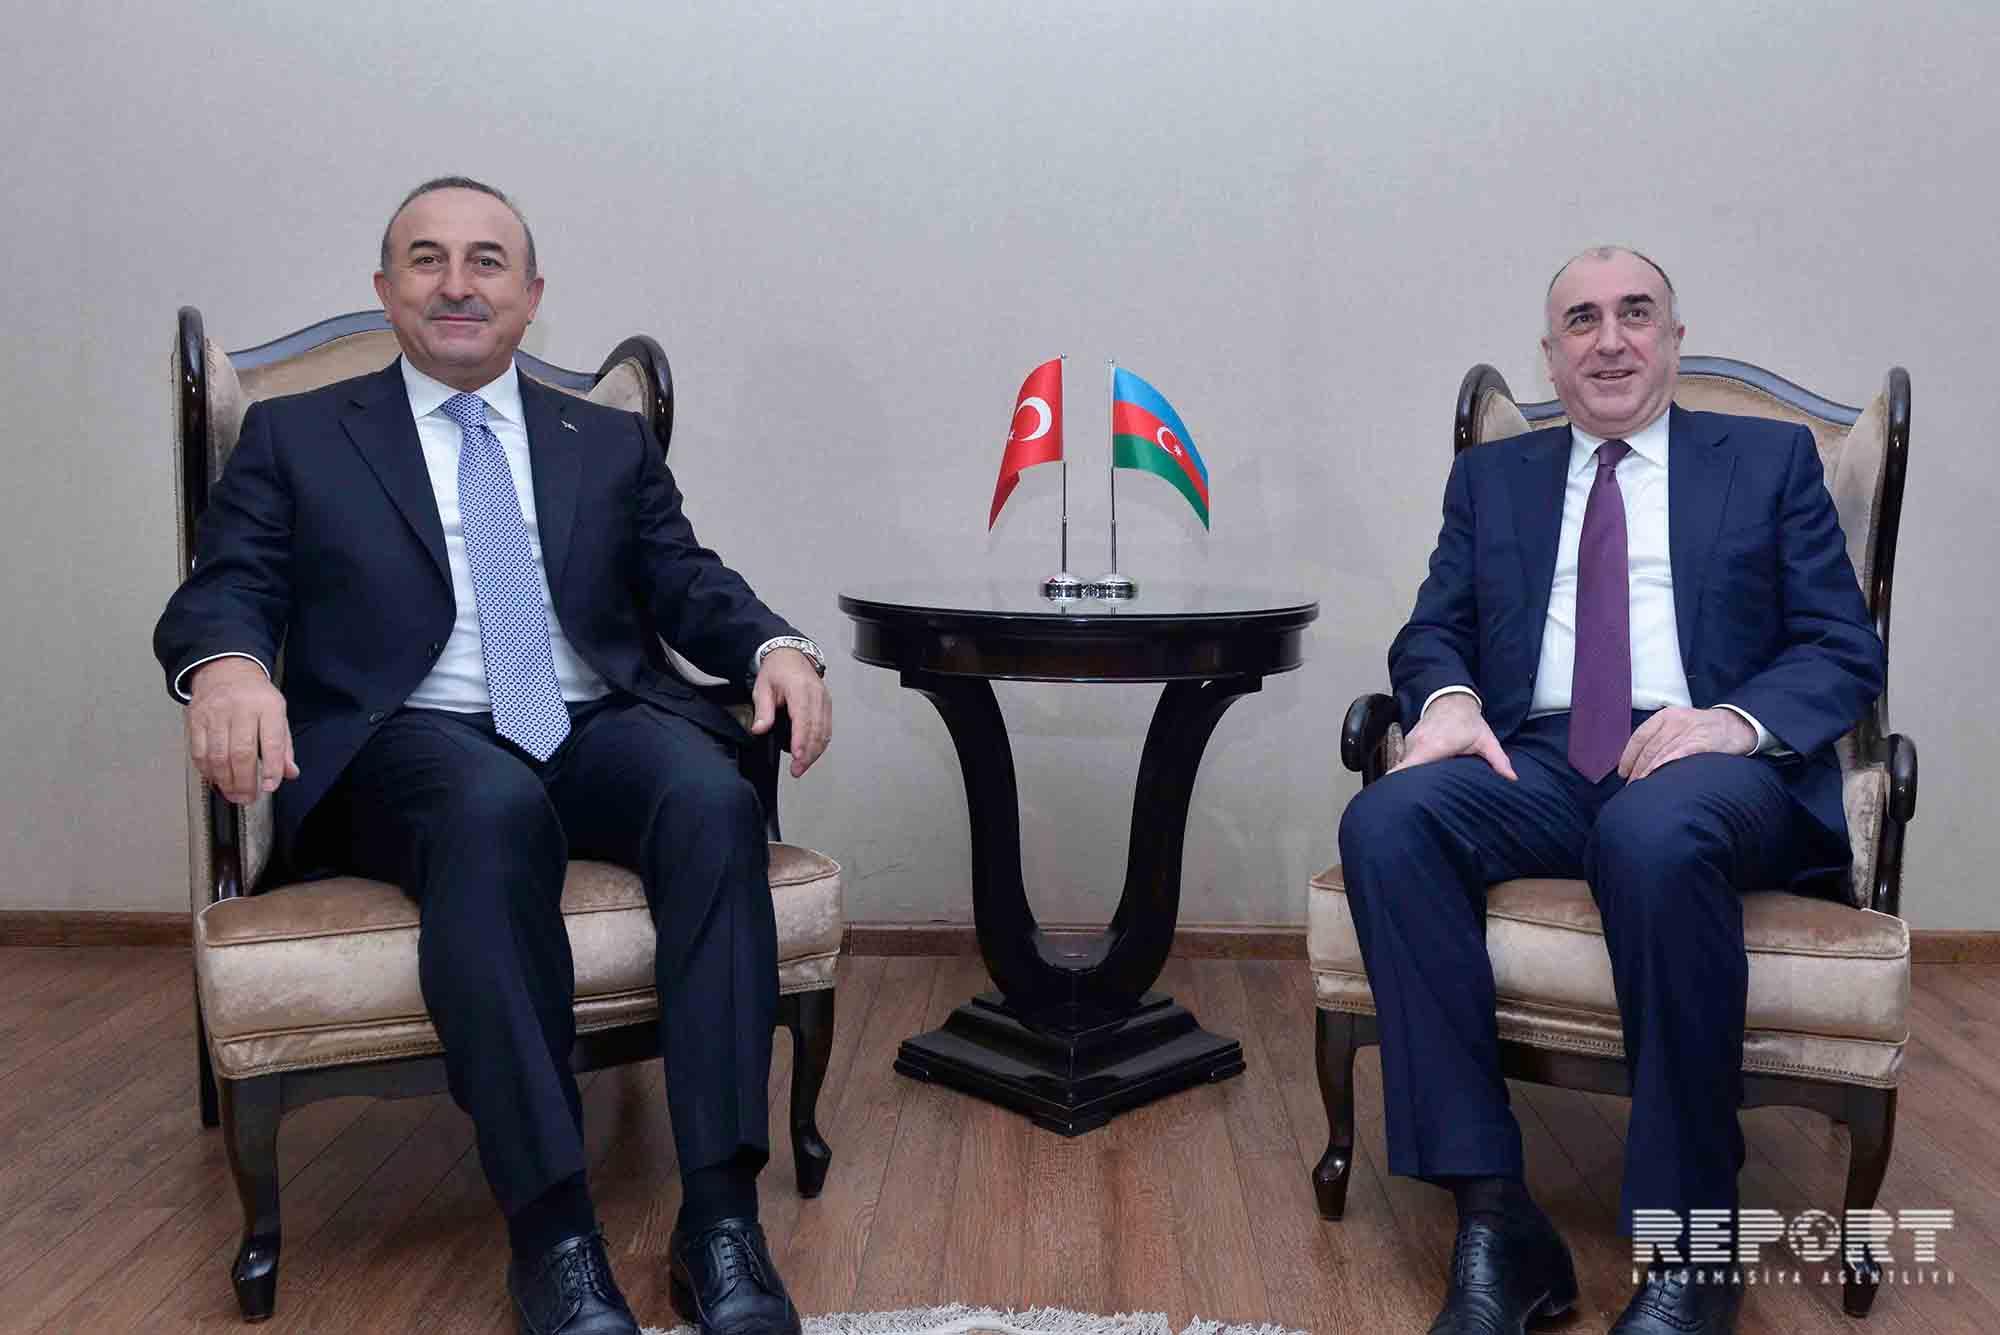 Эльмар Мамедъяров проинформировал турецкую сторону о переговорах по Карабаху